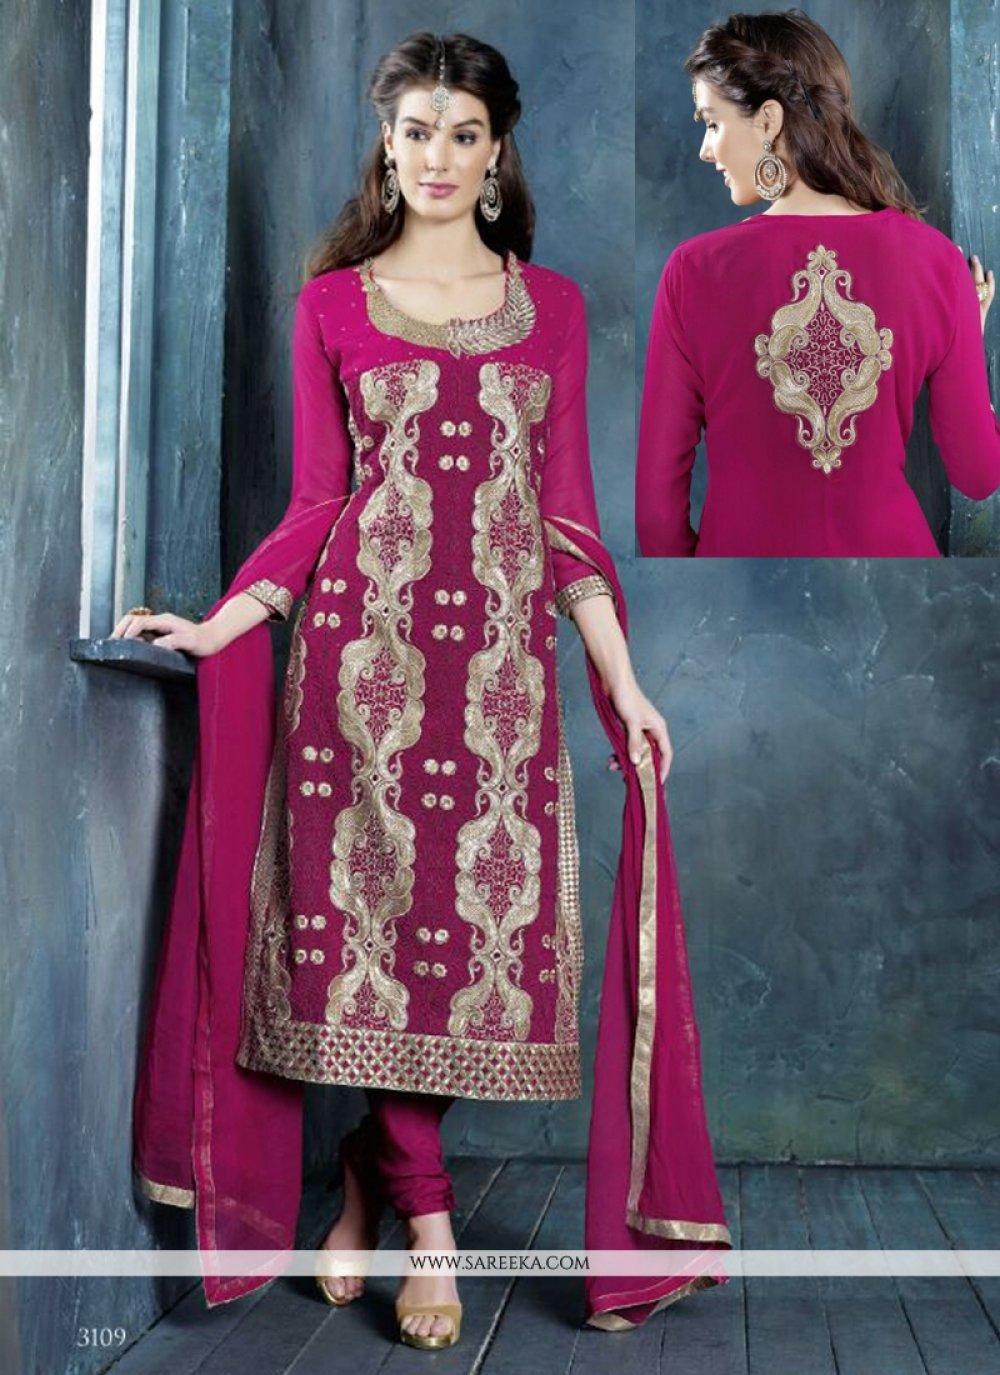 Hot Pink Resham Georgette Churidar Suit